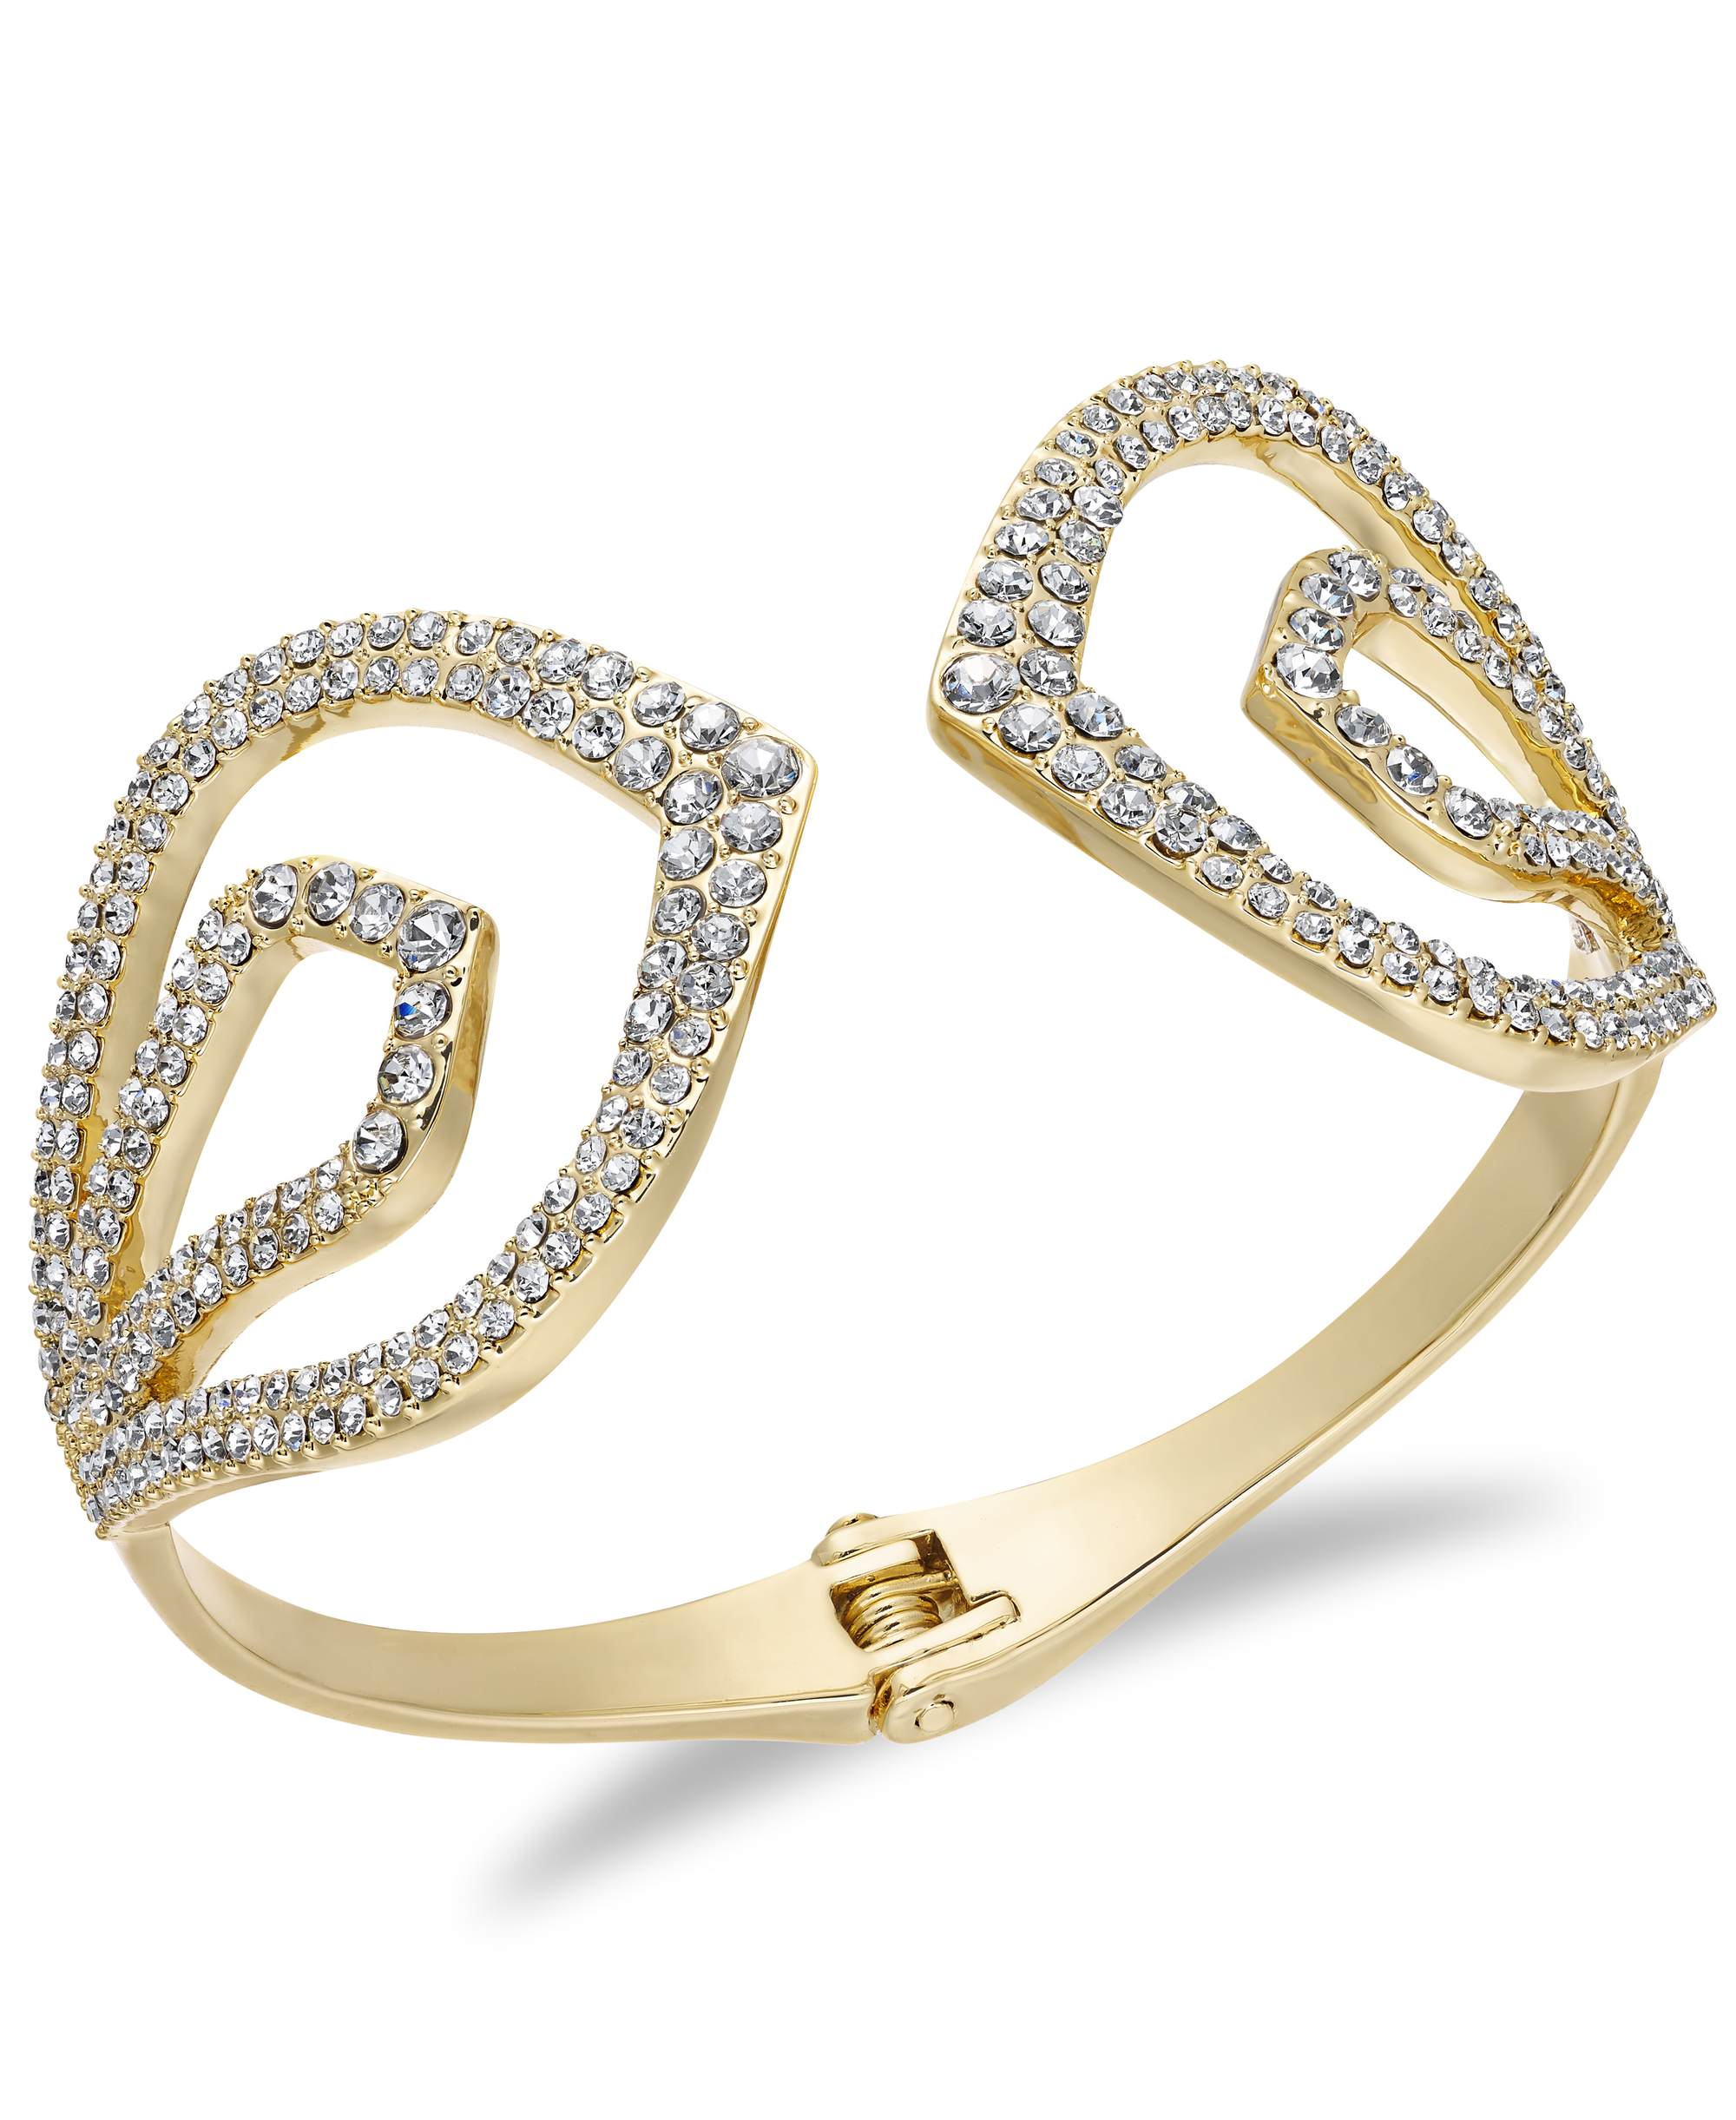 jewelryphotography_gold_macys.jpg